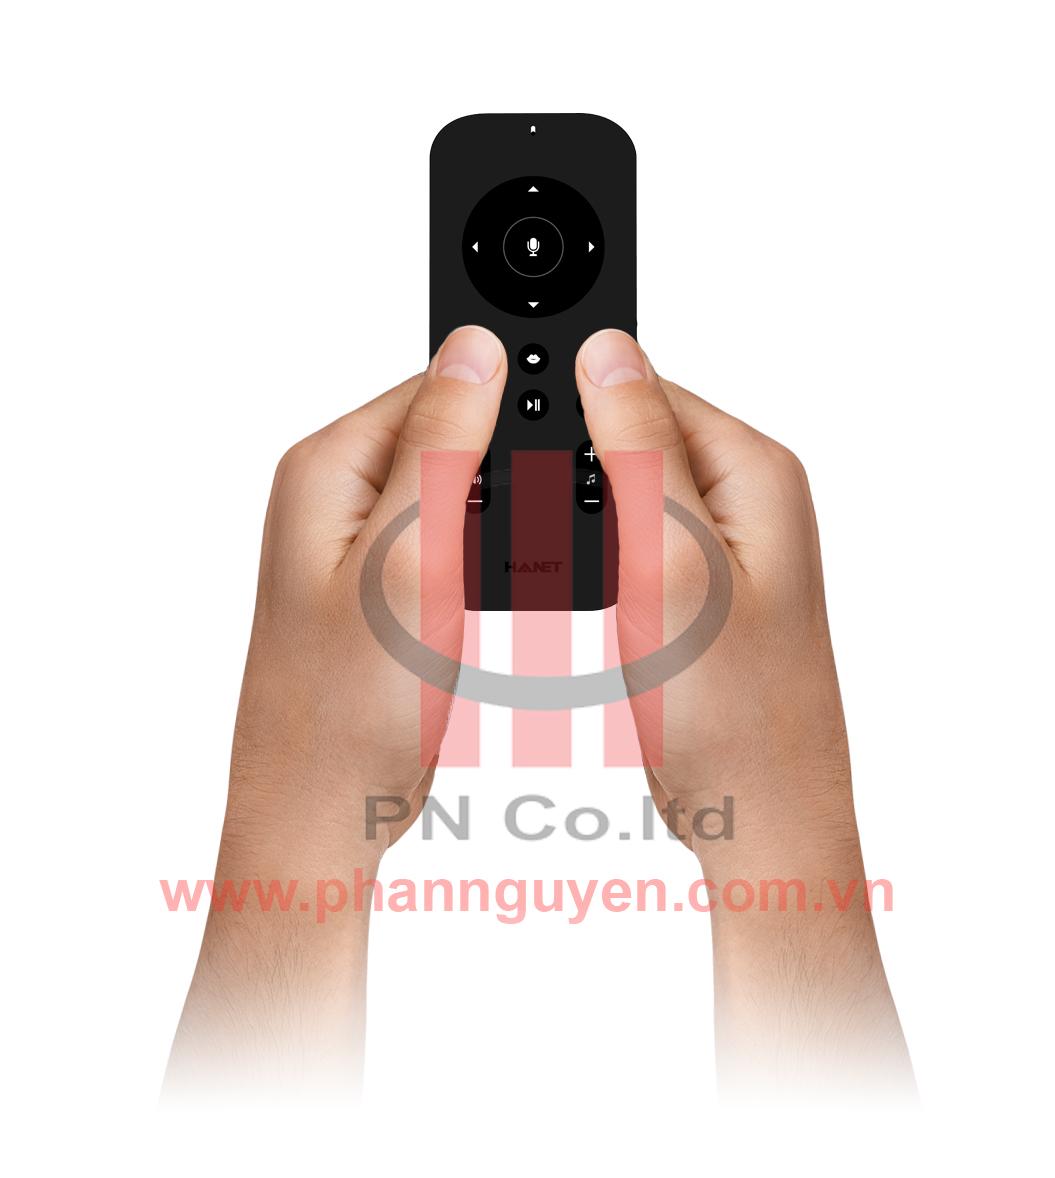 Hướng dẫn Pair Remote Hanet PlayX One